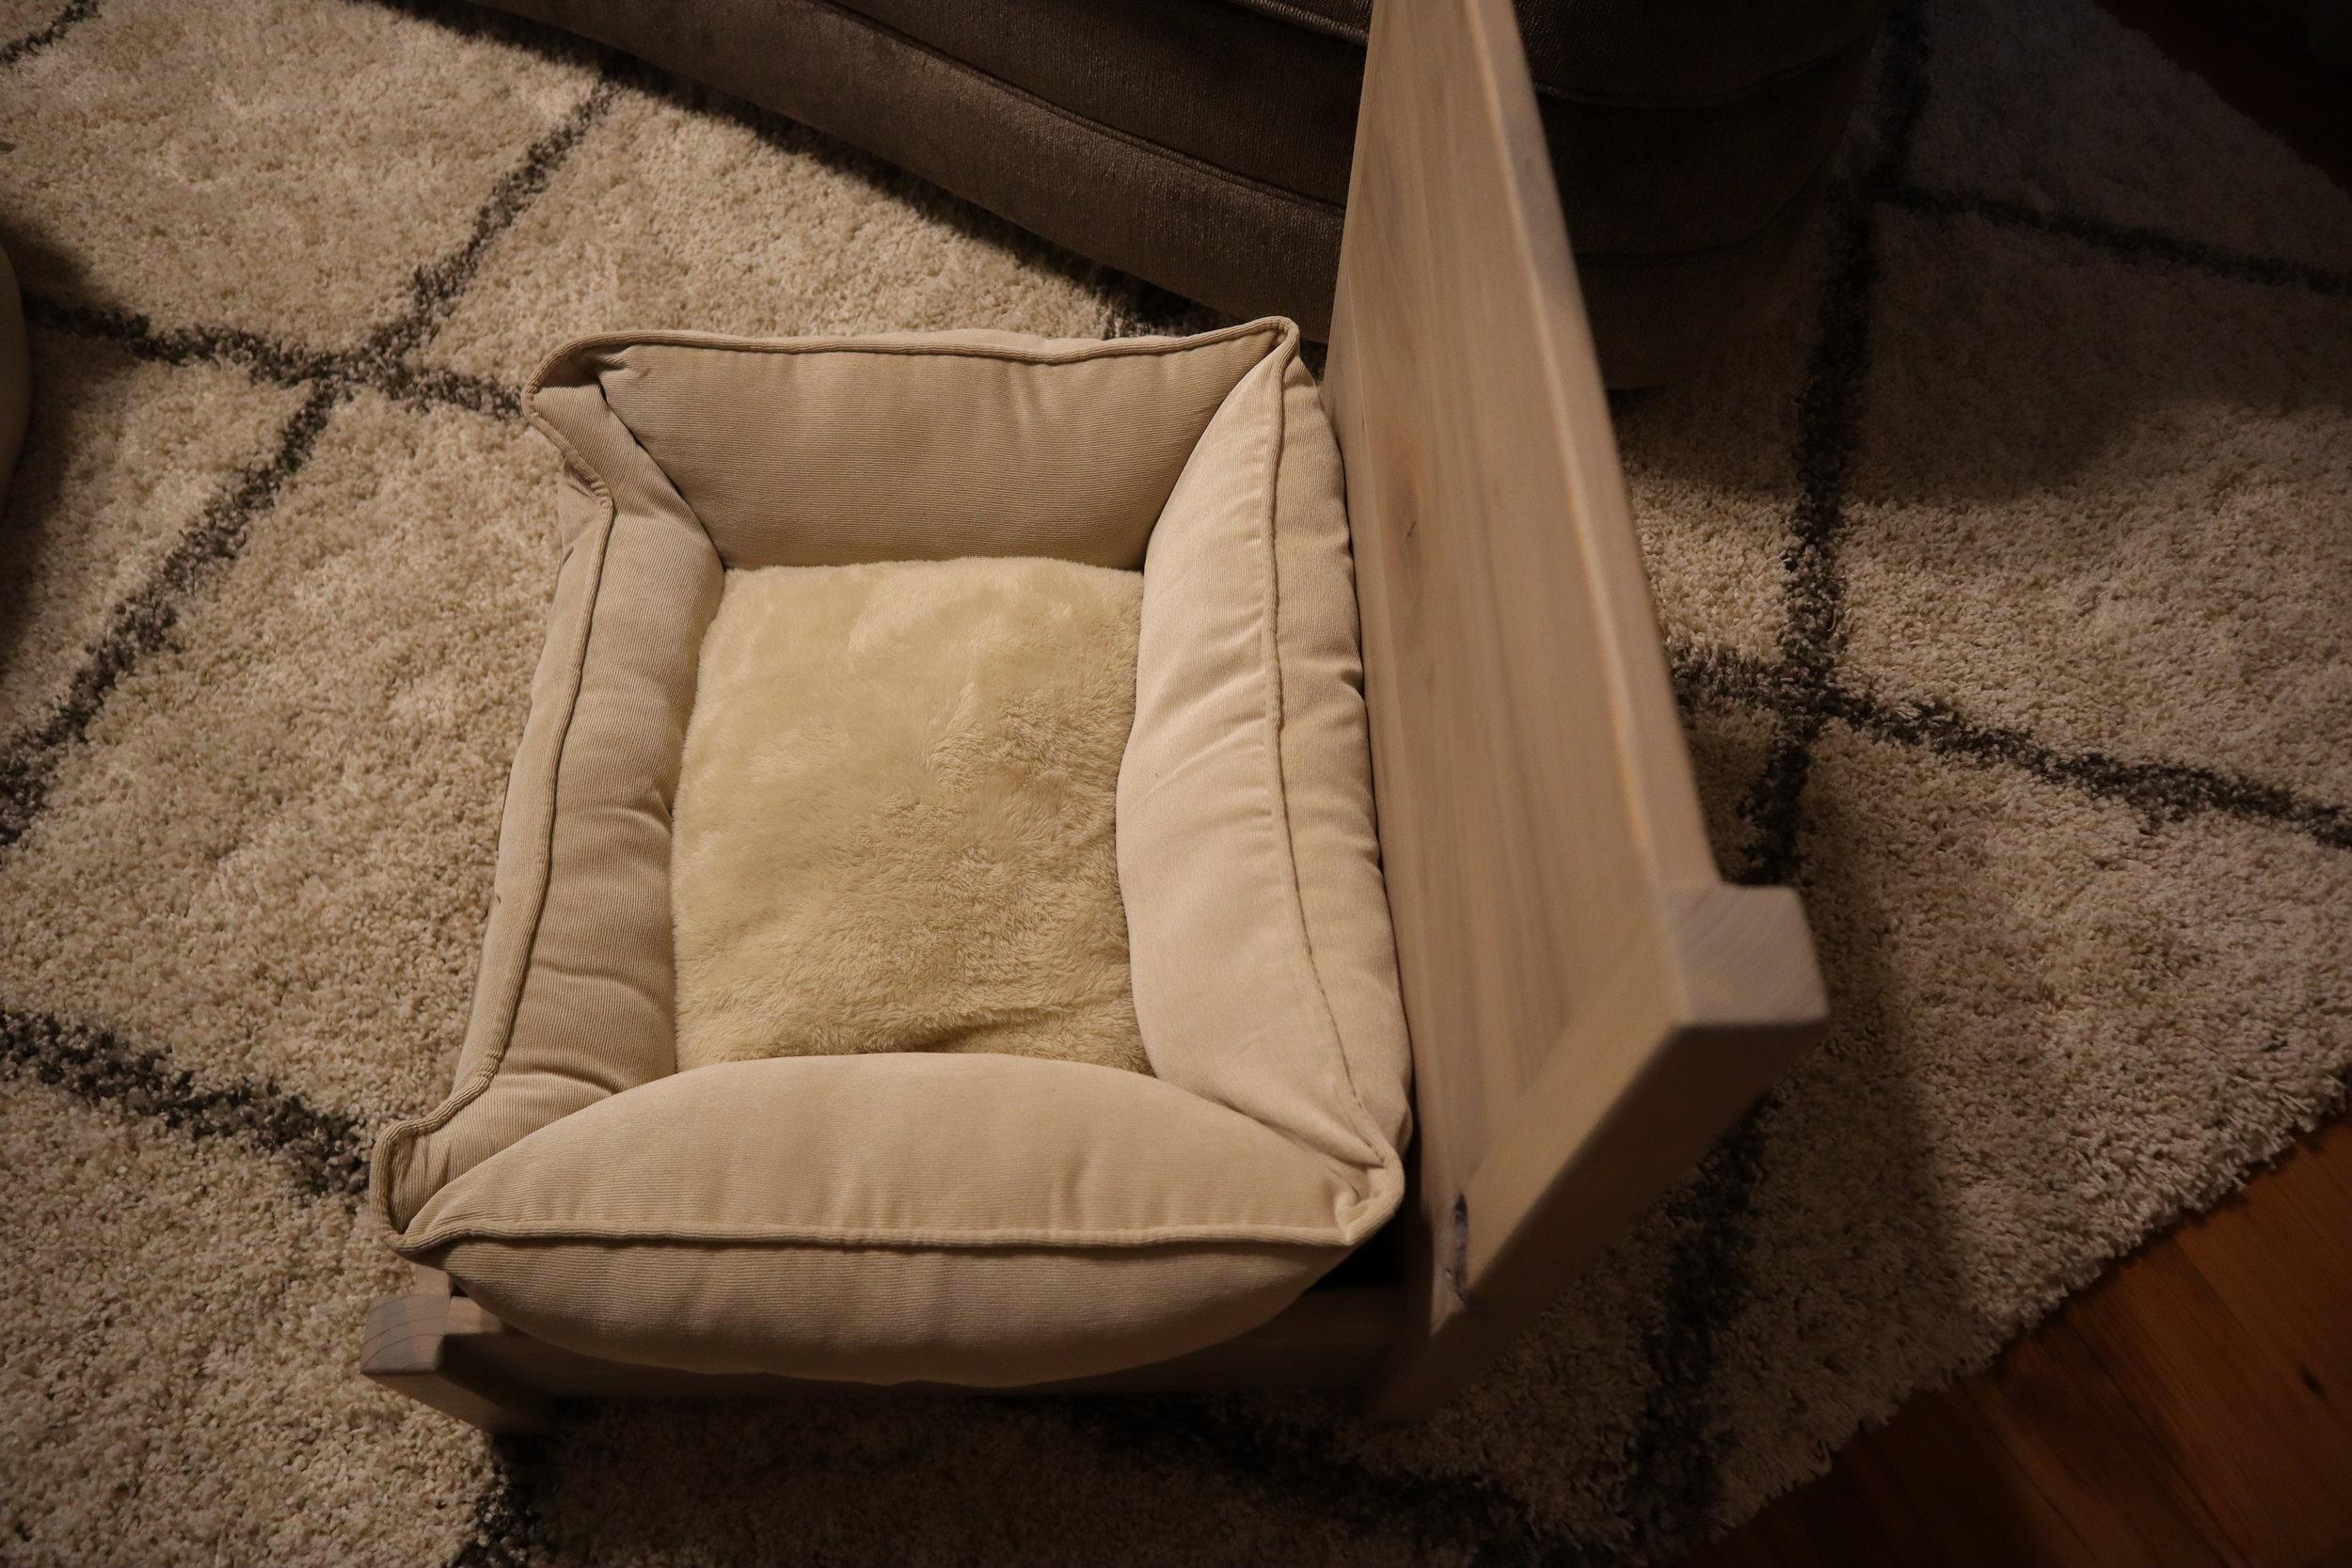 greyhound dog bed.JPG